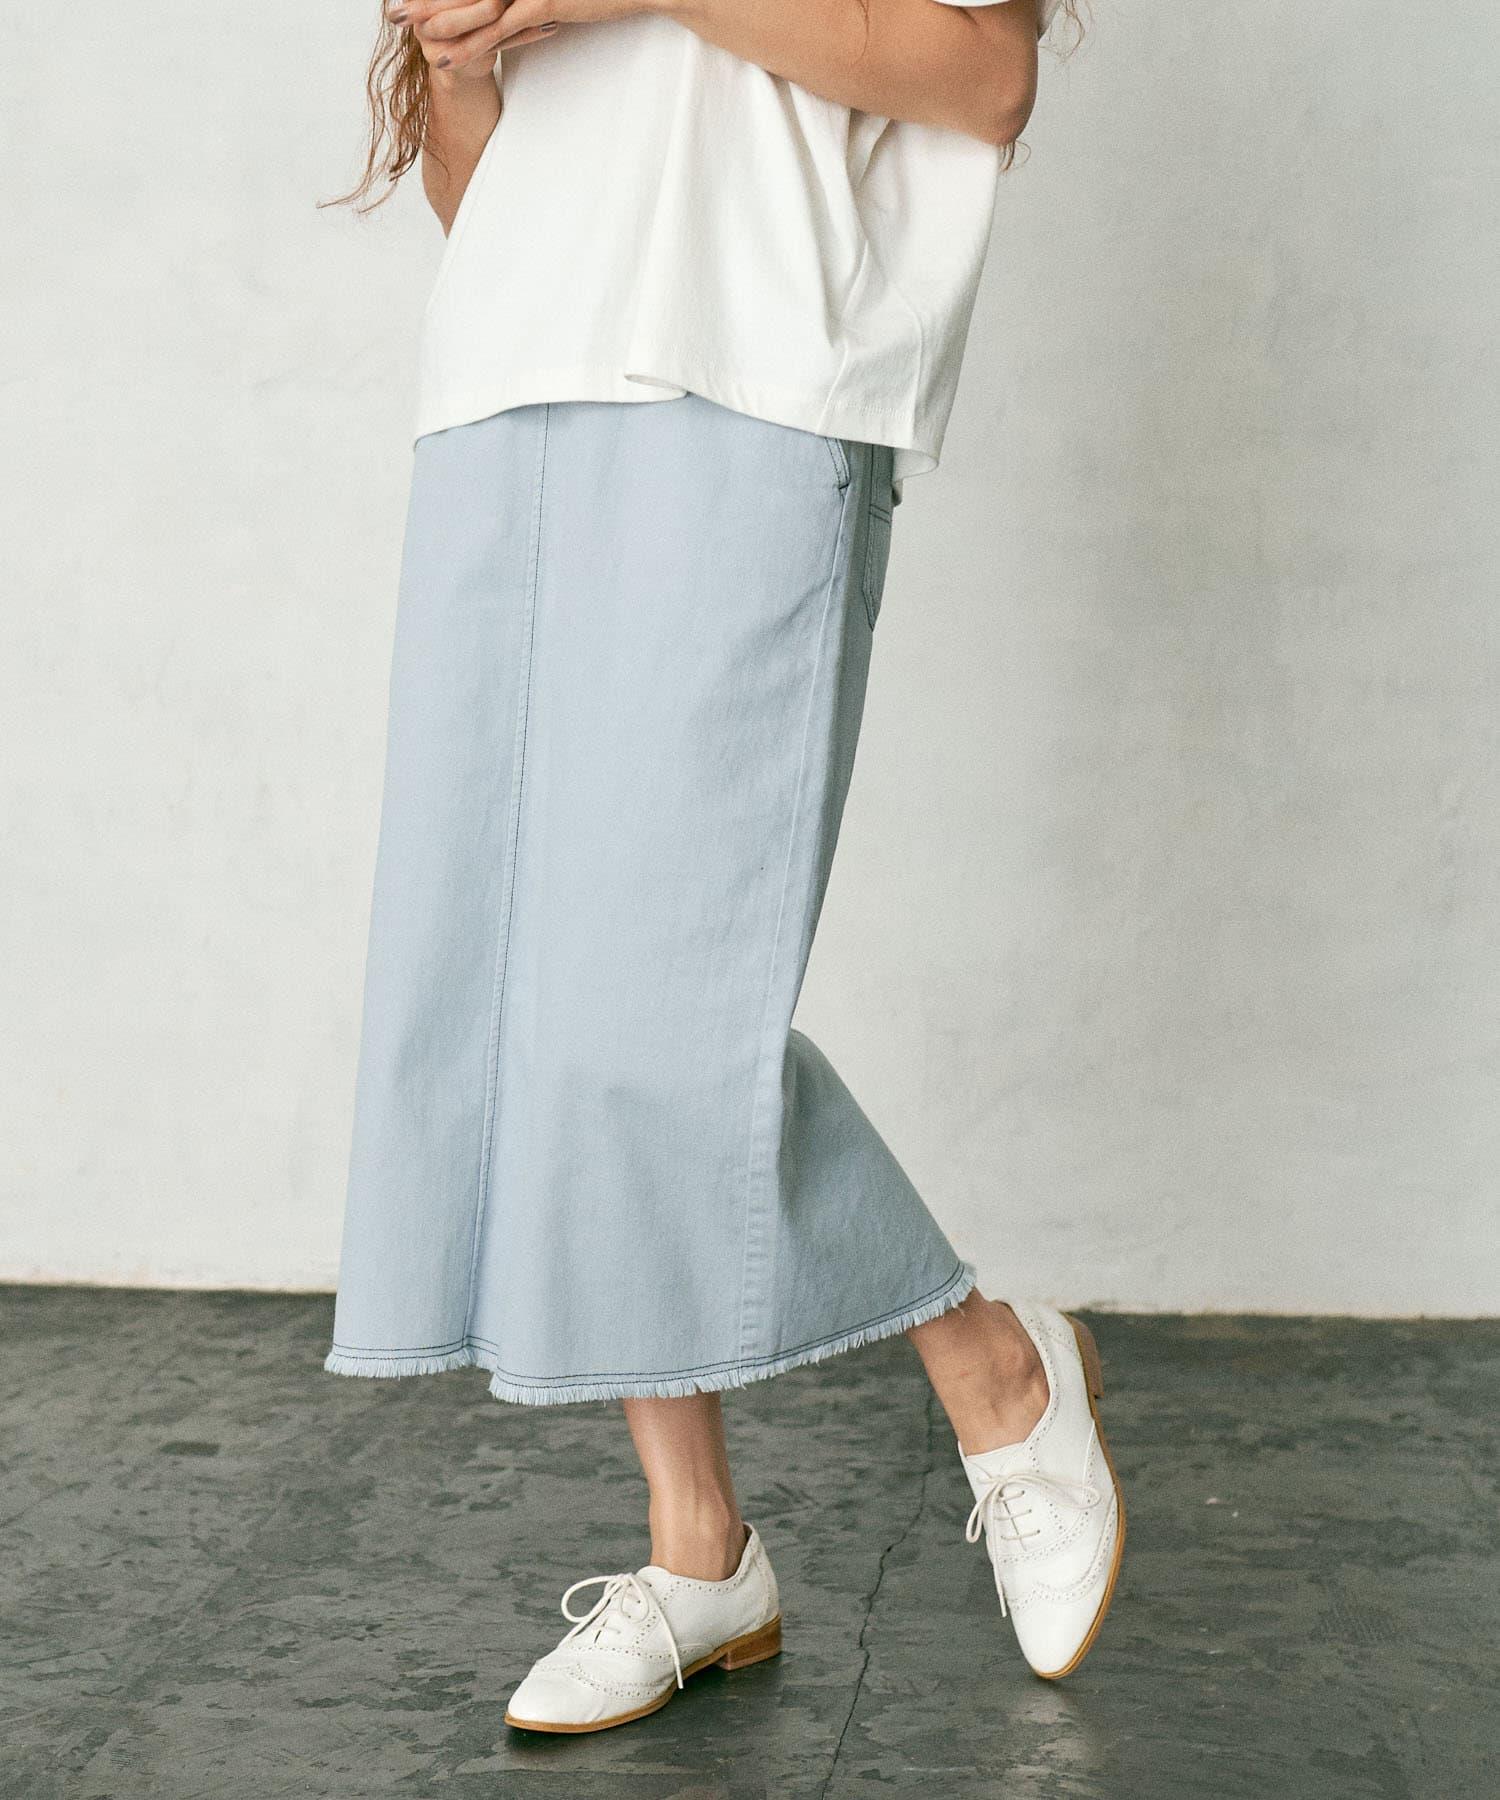 pual ce cin(ピュアルセシン) 【WEB限定】甘織ツイル×配色ステッチスカート